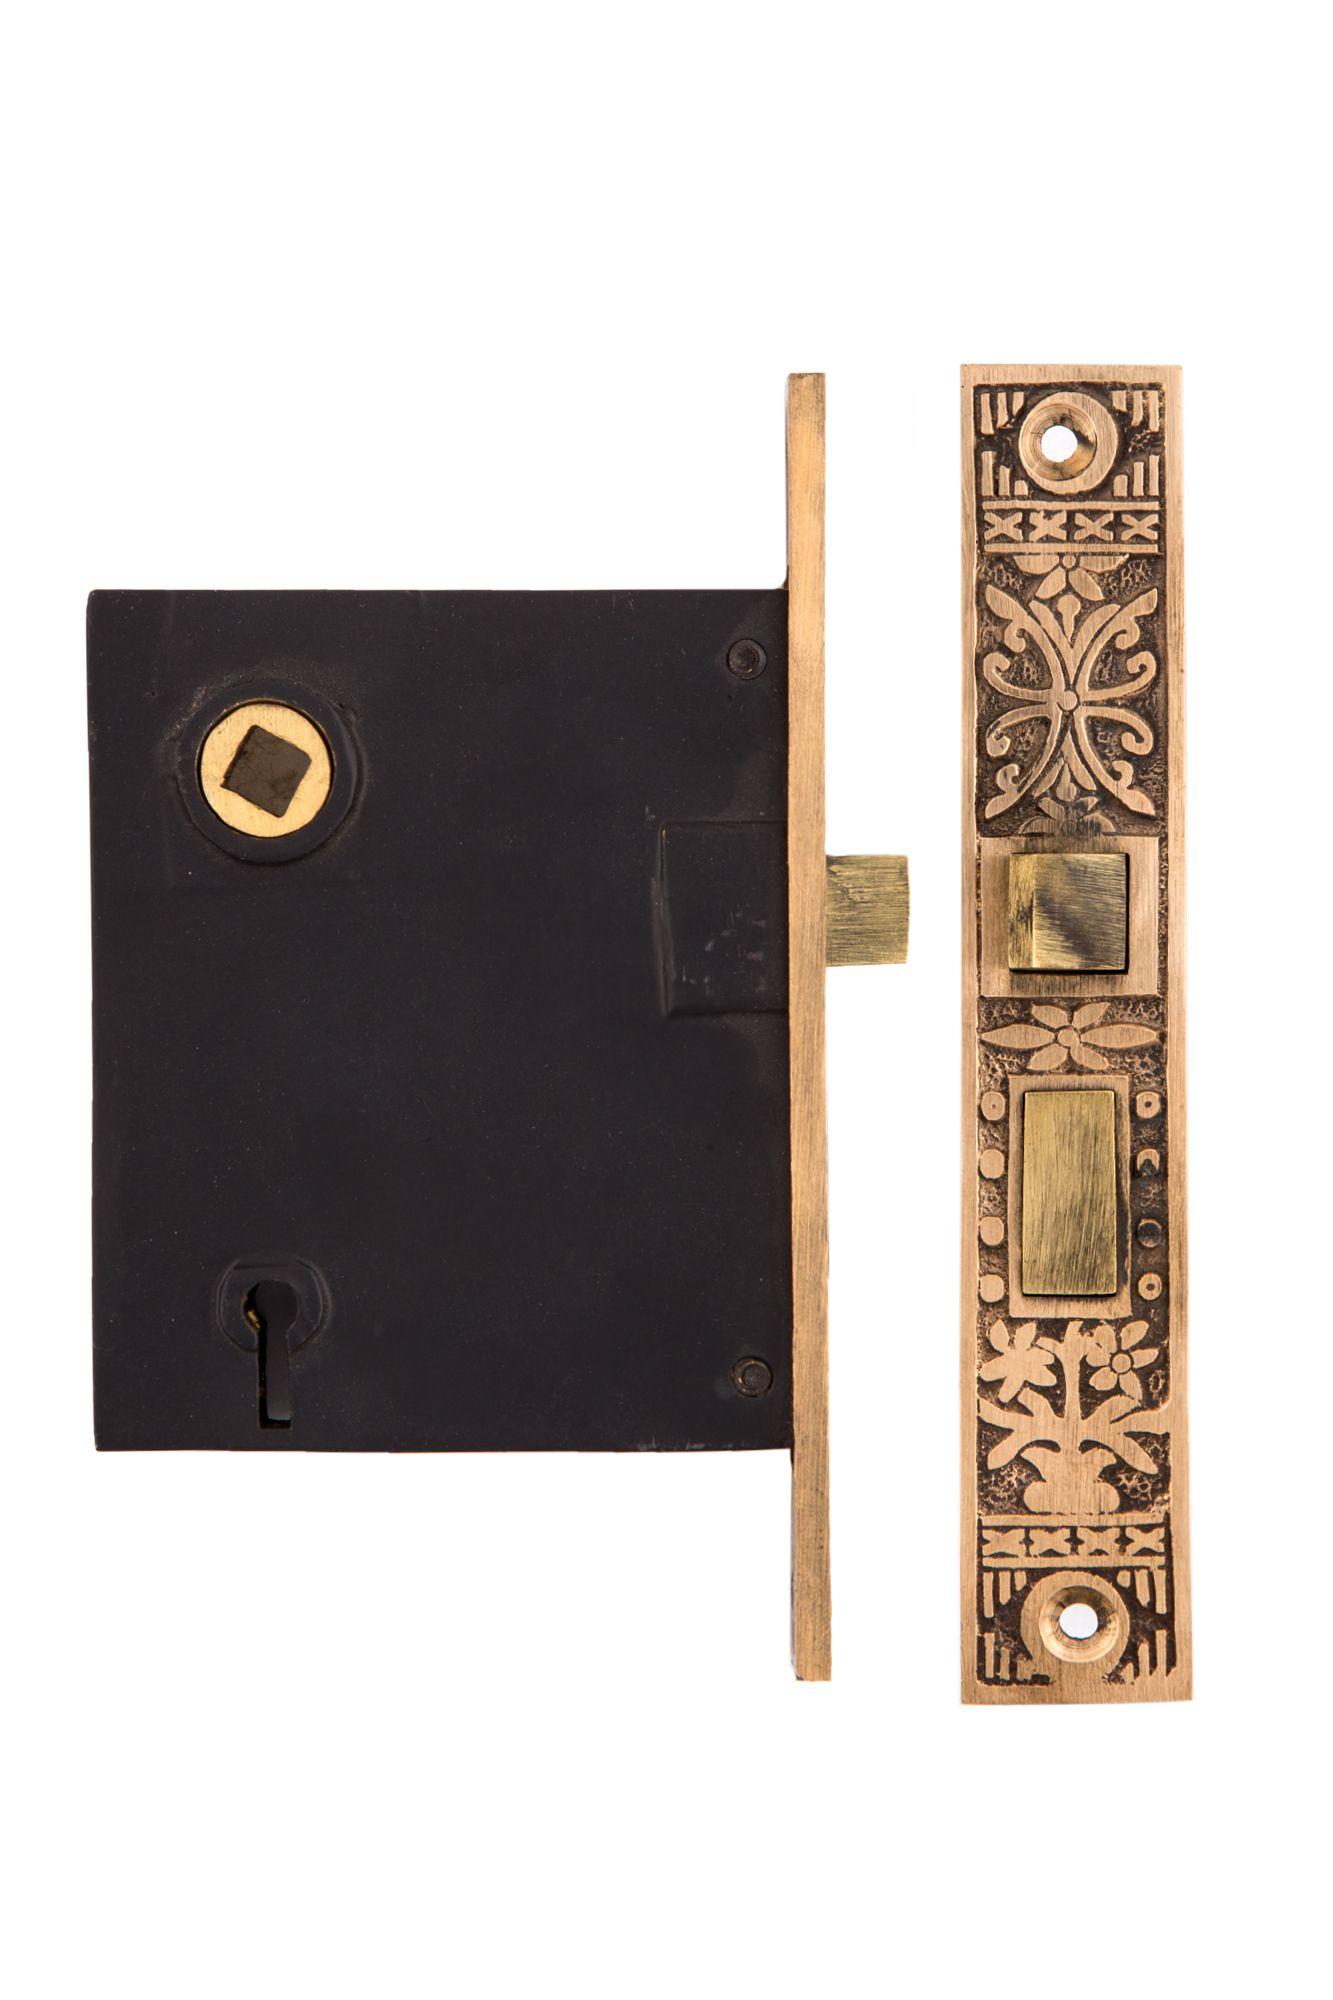 Potted Flower Mortise Lock W Strike Plate 0617 Us By Charleston Hardware Antique Restoration Decorative Hardware Restoration Hardware